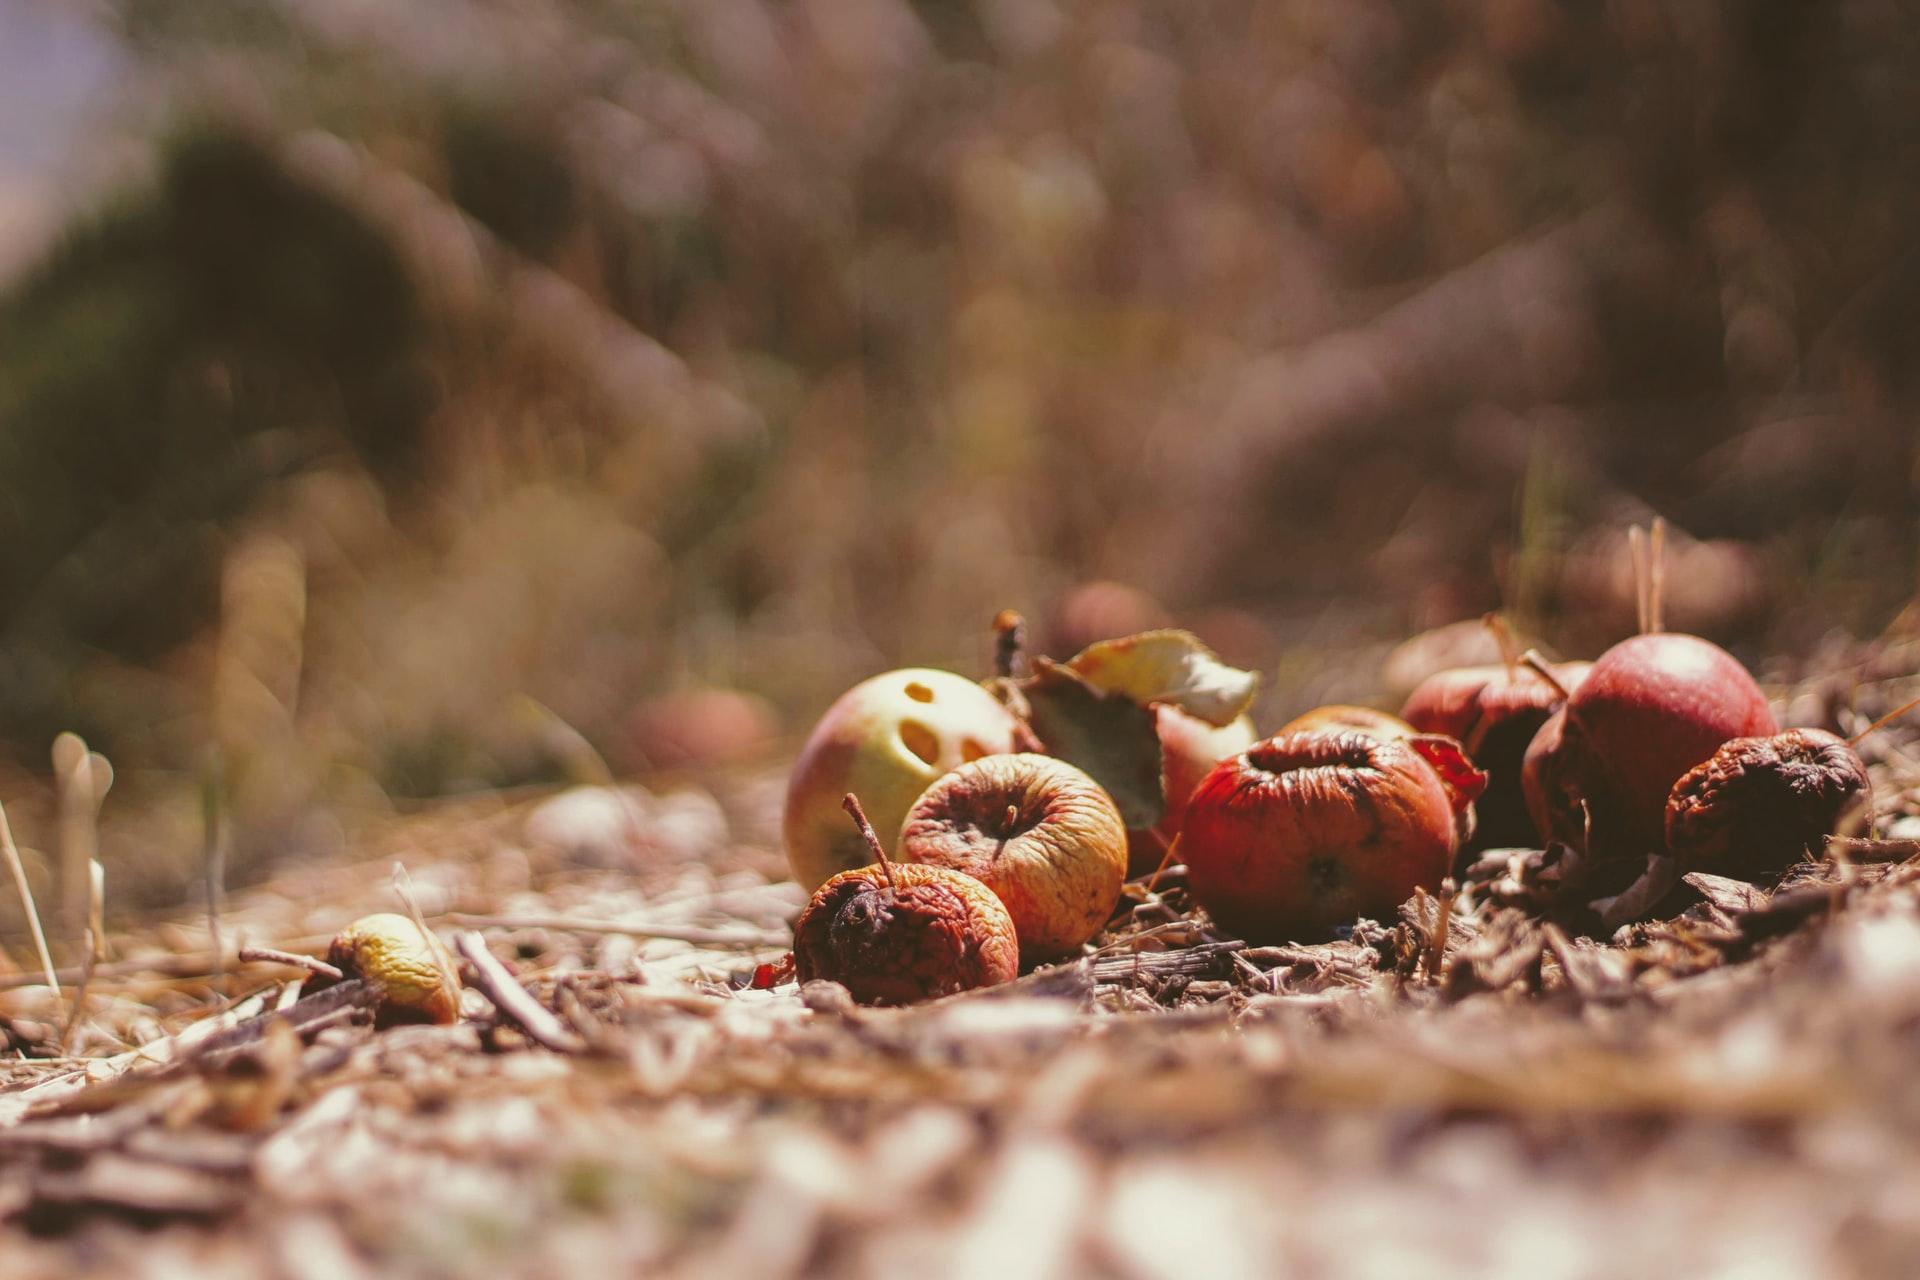 SDGs目標と食品ロス削減に向けた取り組み